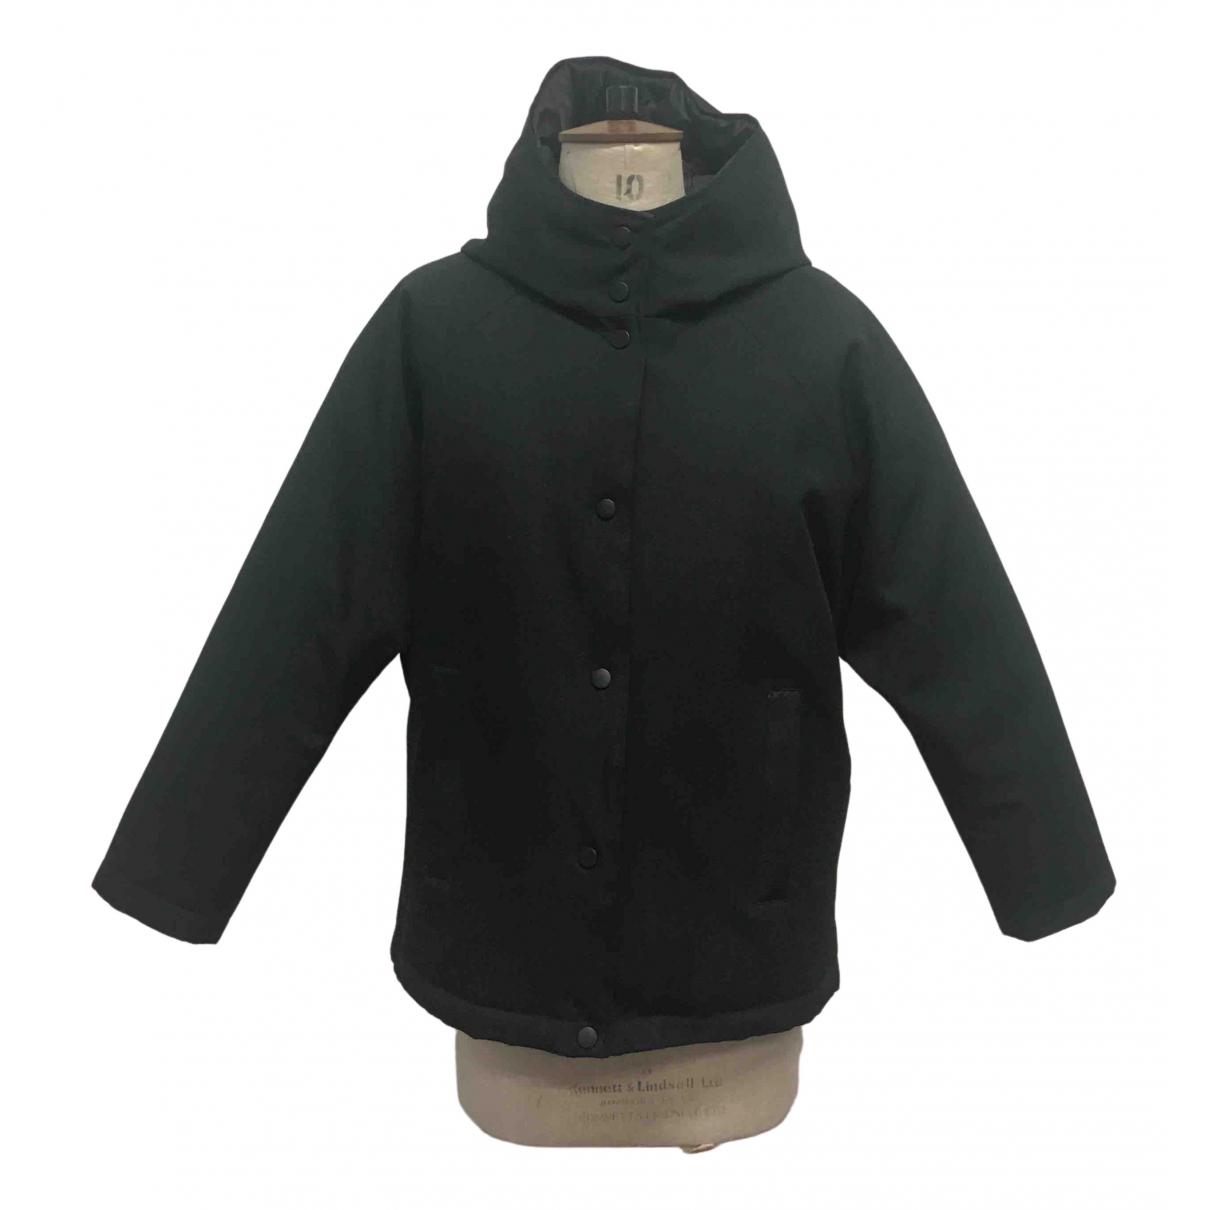 Bimba Y Lola \N Black jacket for Women M International